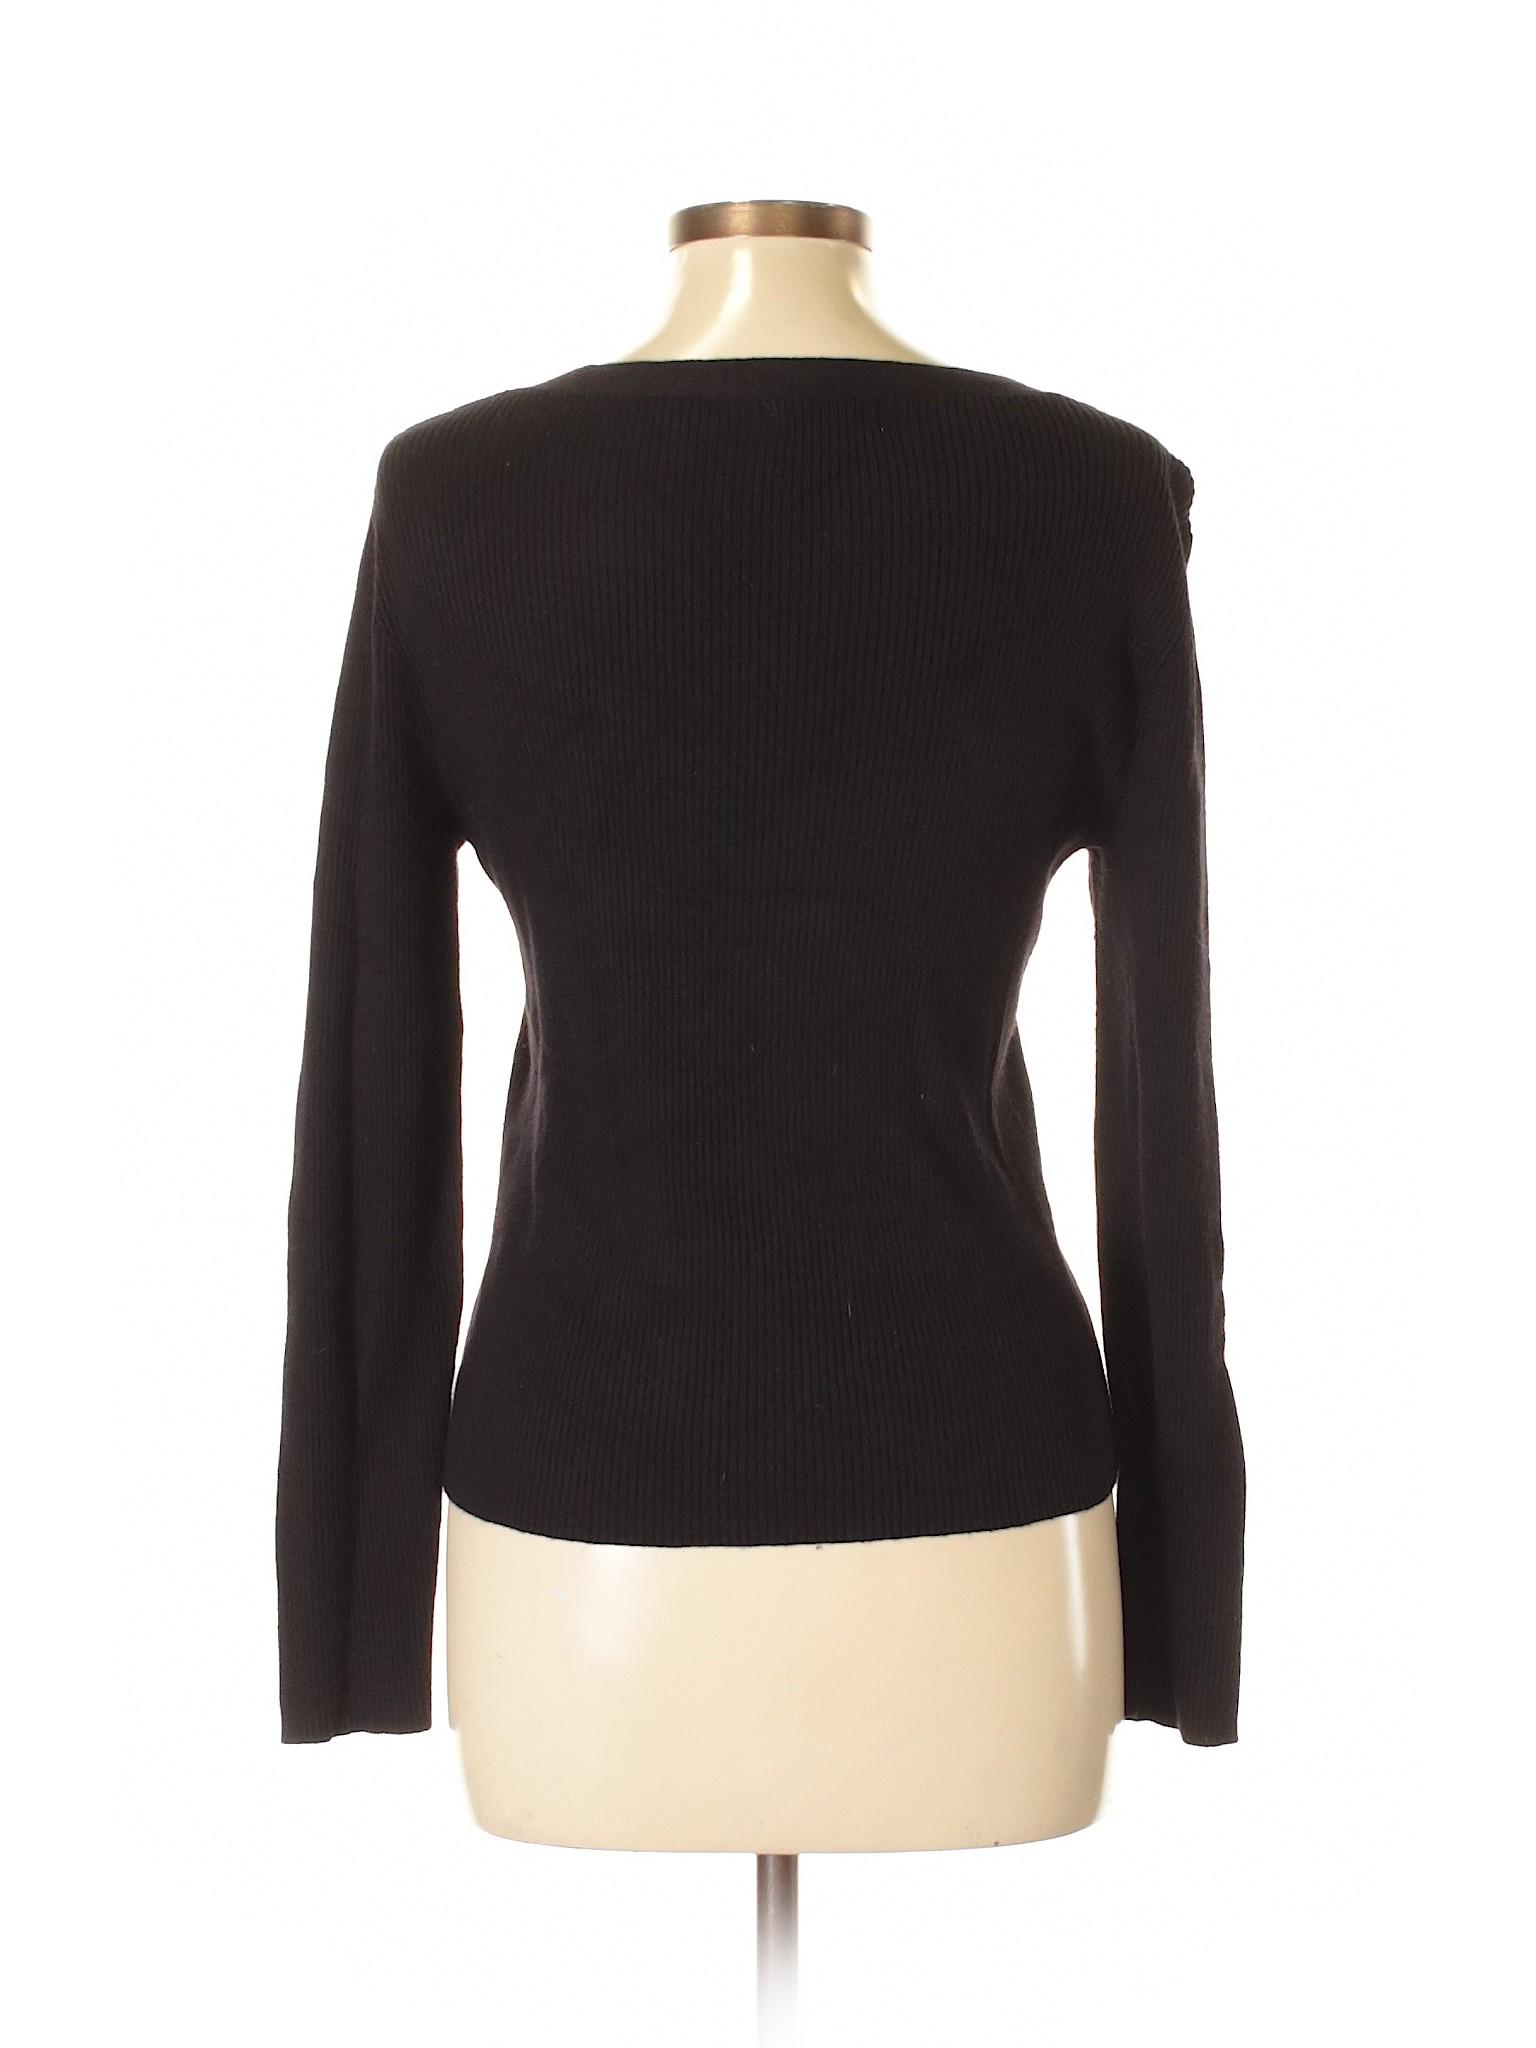 9 Boutique Pullover Apt Apt Boutique Apt Sweater Sweater Pullover Boutique 9 P4wdHq8dxa